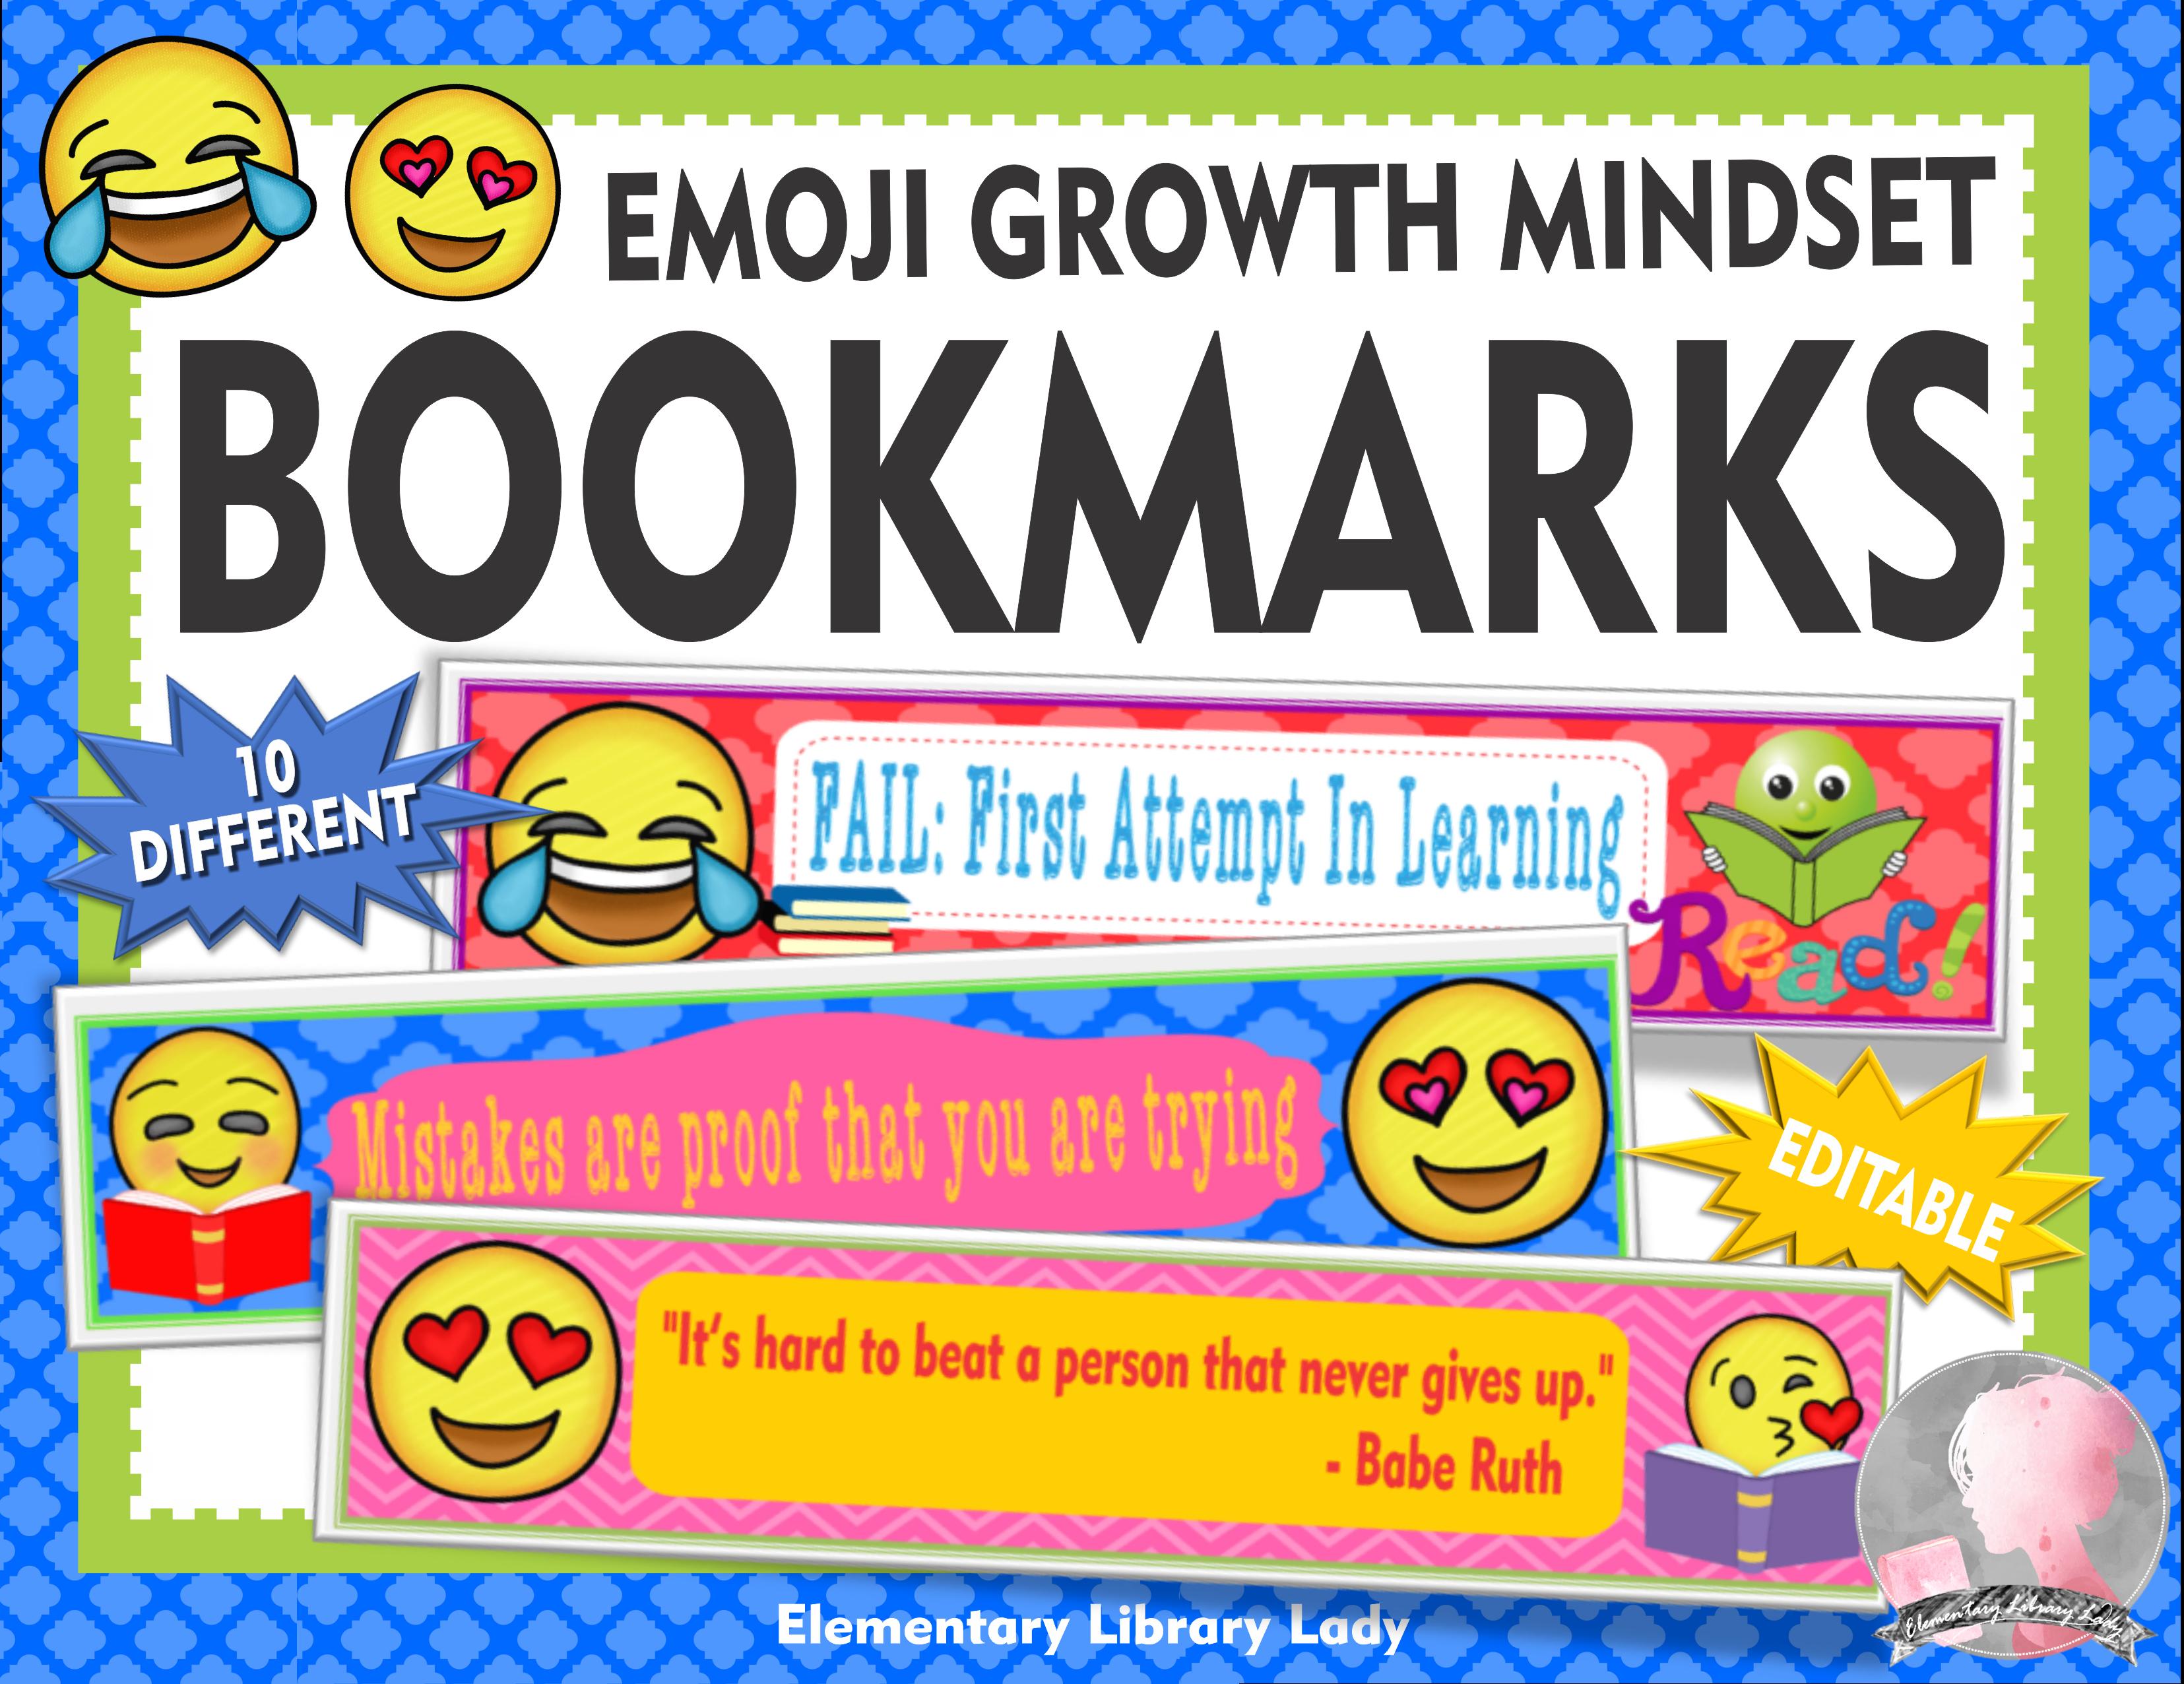 Swell Emoji Decor Growth Mindset Bookmarks Shelf Markers Or Desk Download Free Architecture Designs Scobabritishbridgeorg